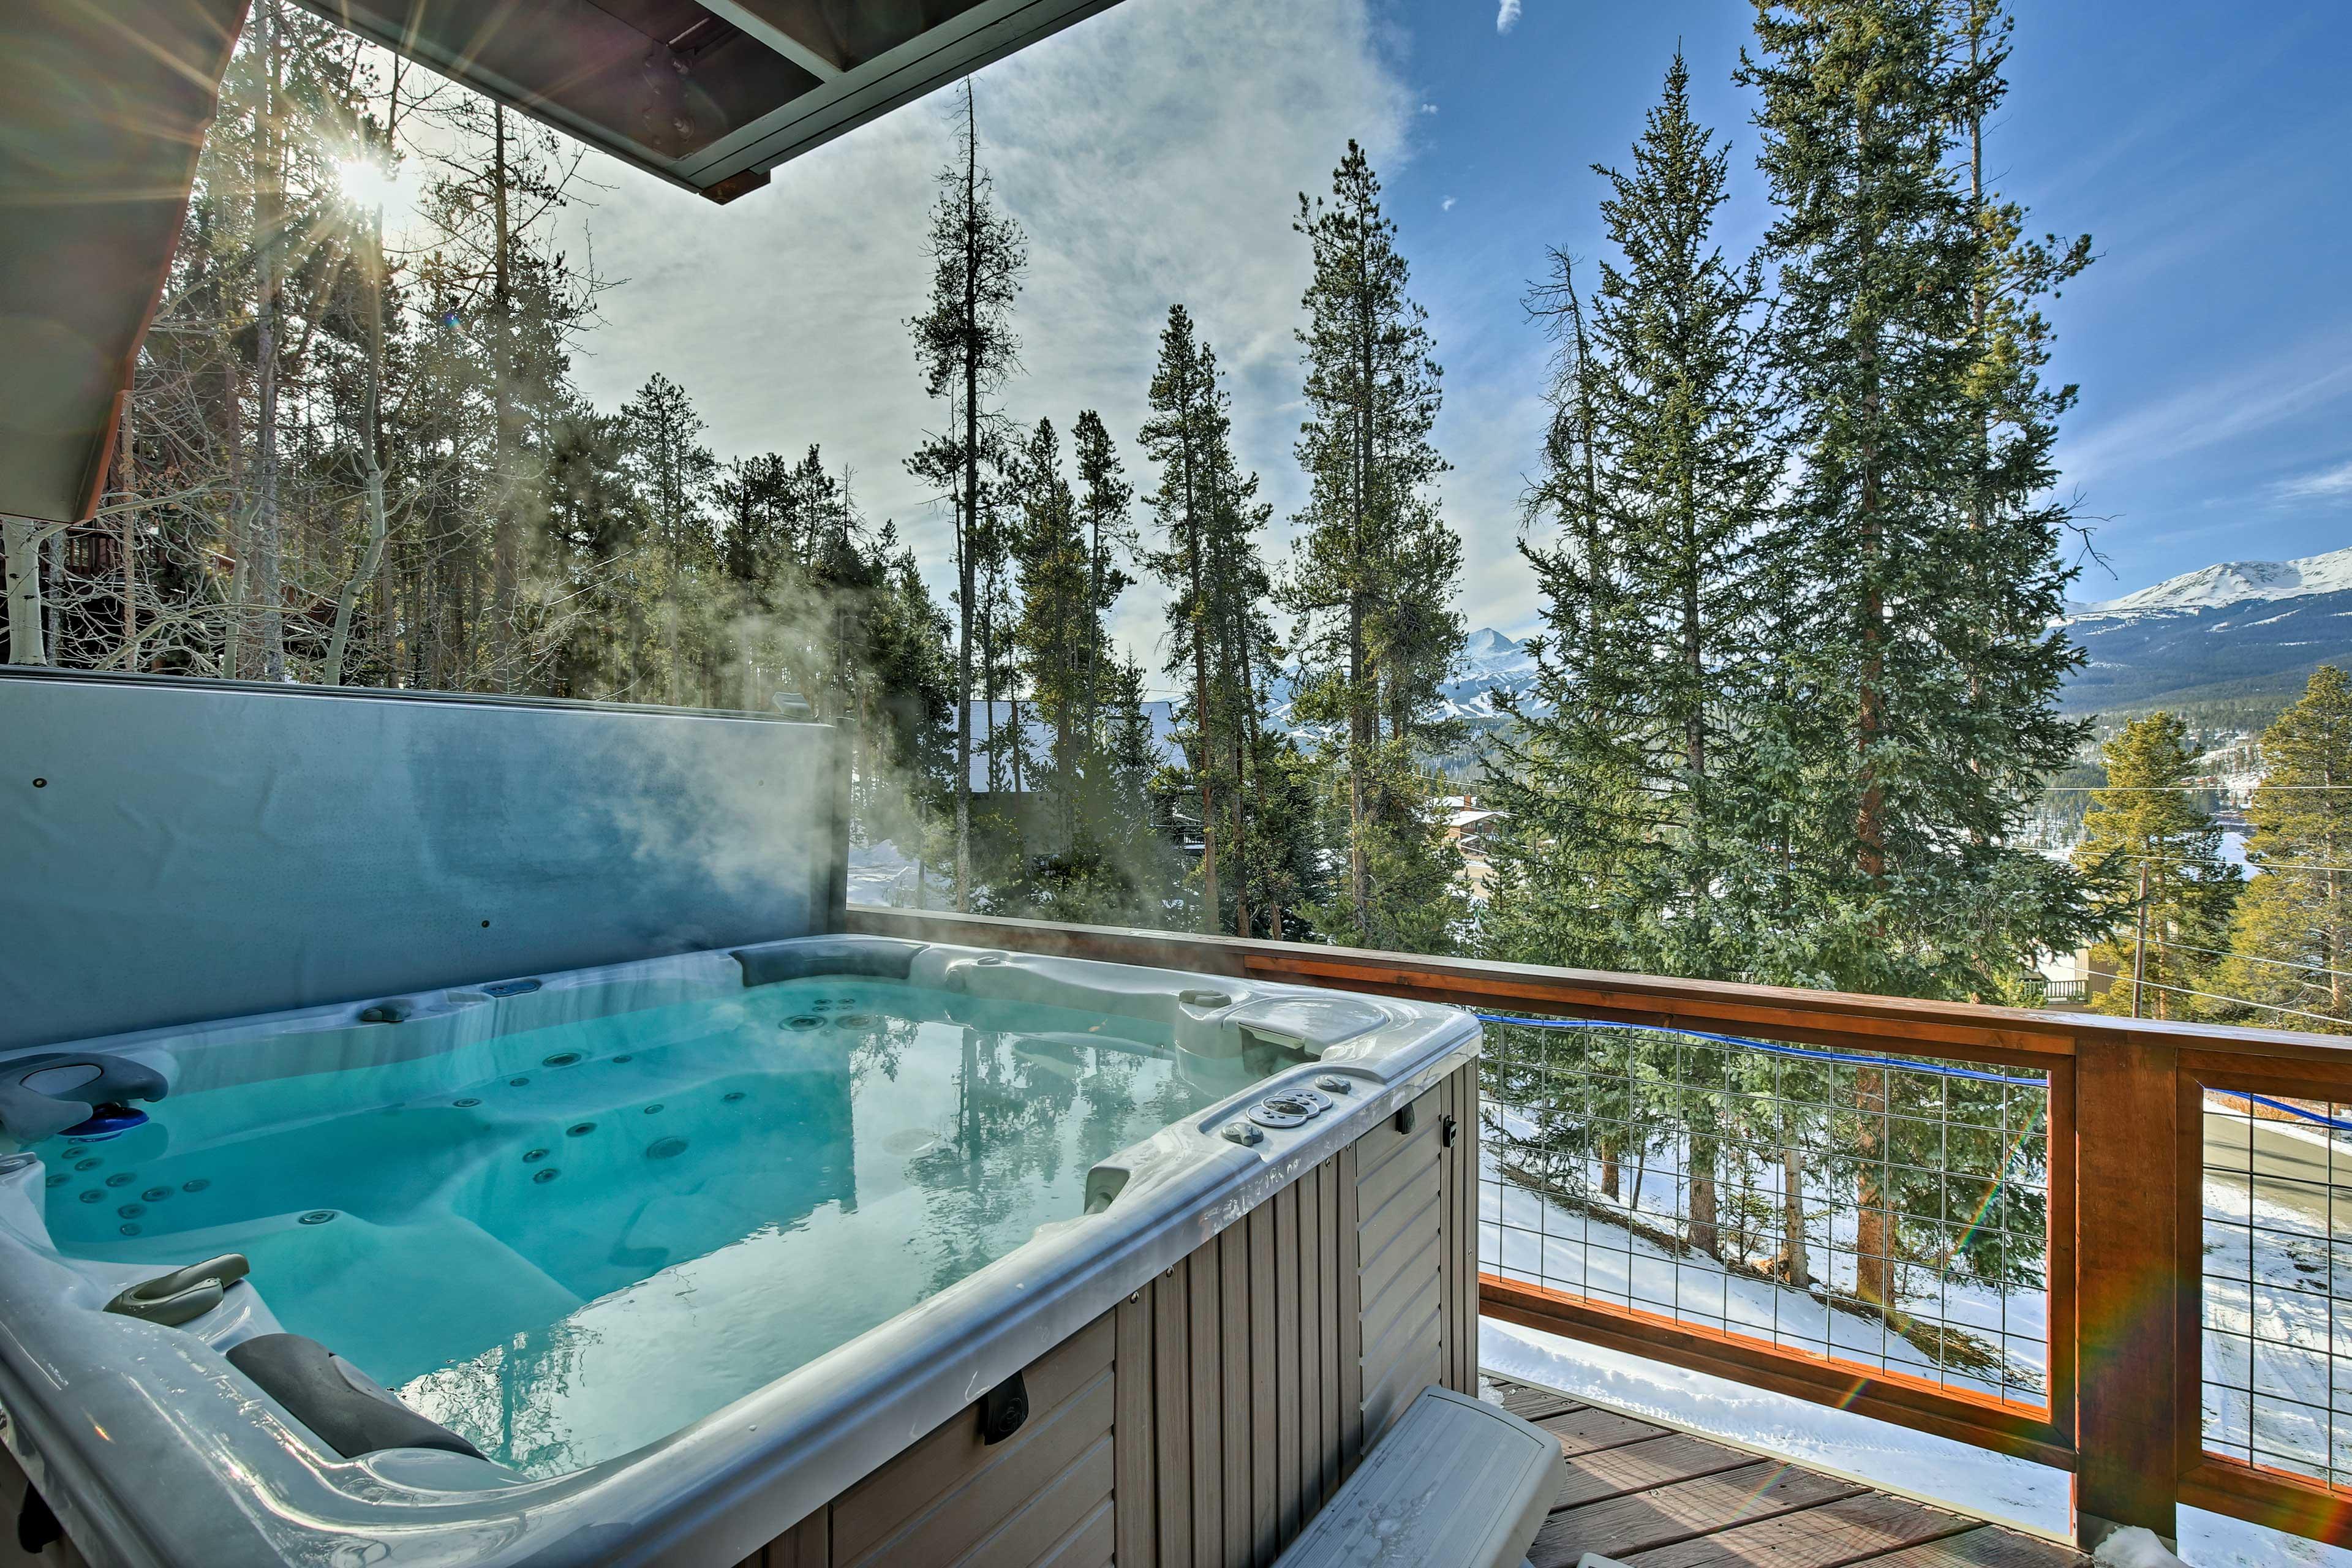 Breckenridge Vacation Rental | 3BR | 2BA | 1,788 Sq Ft